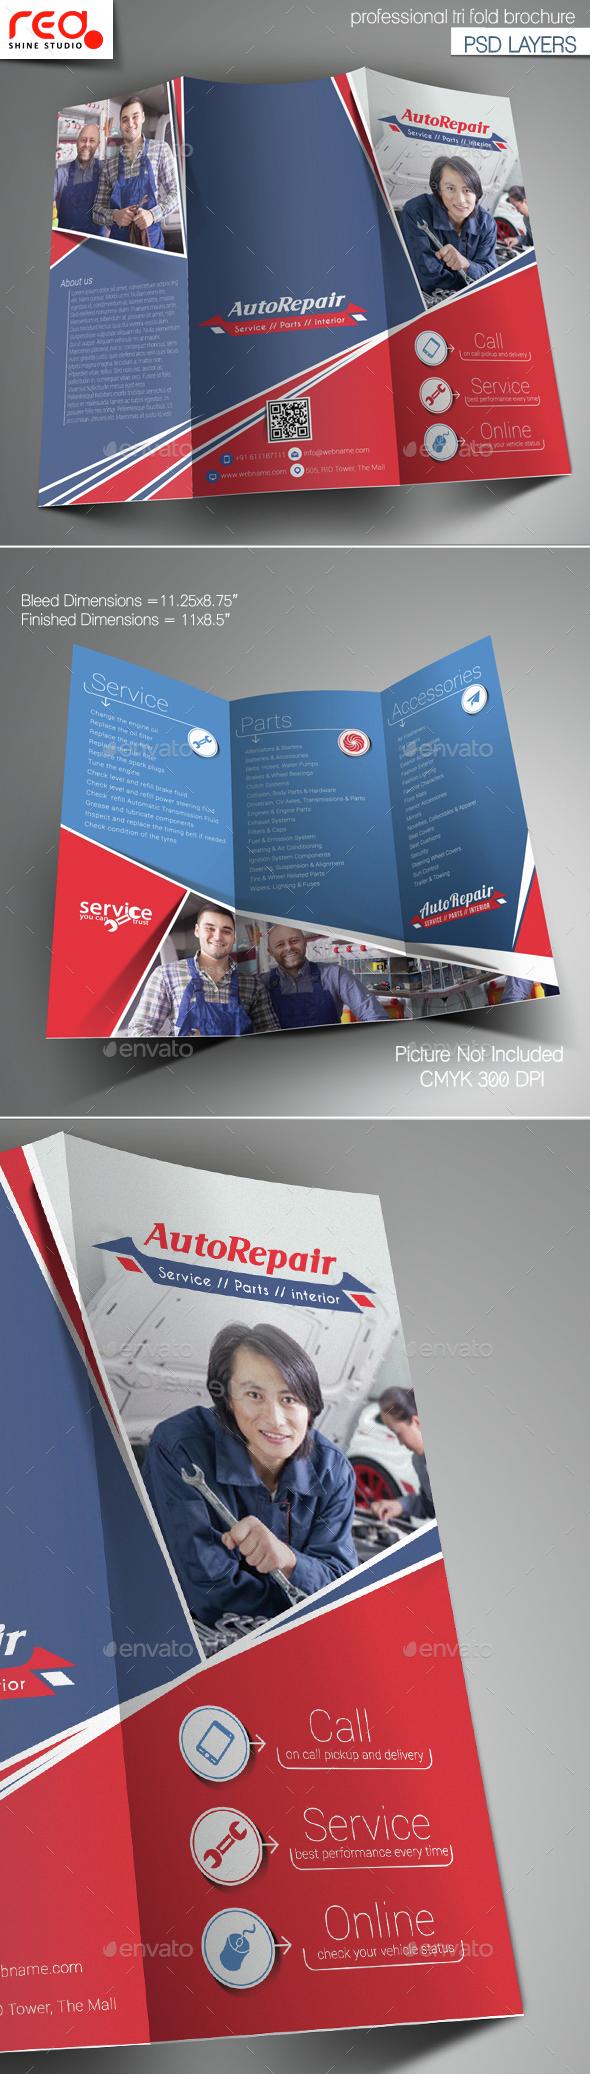 Auto Center Trifold Brochure Template - Corporate Brochures